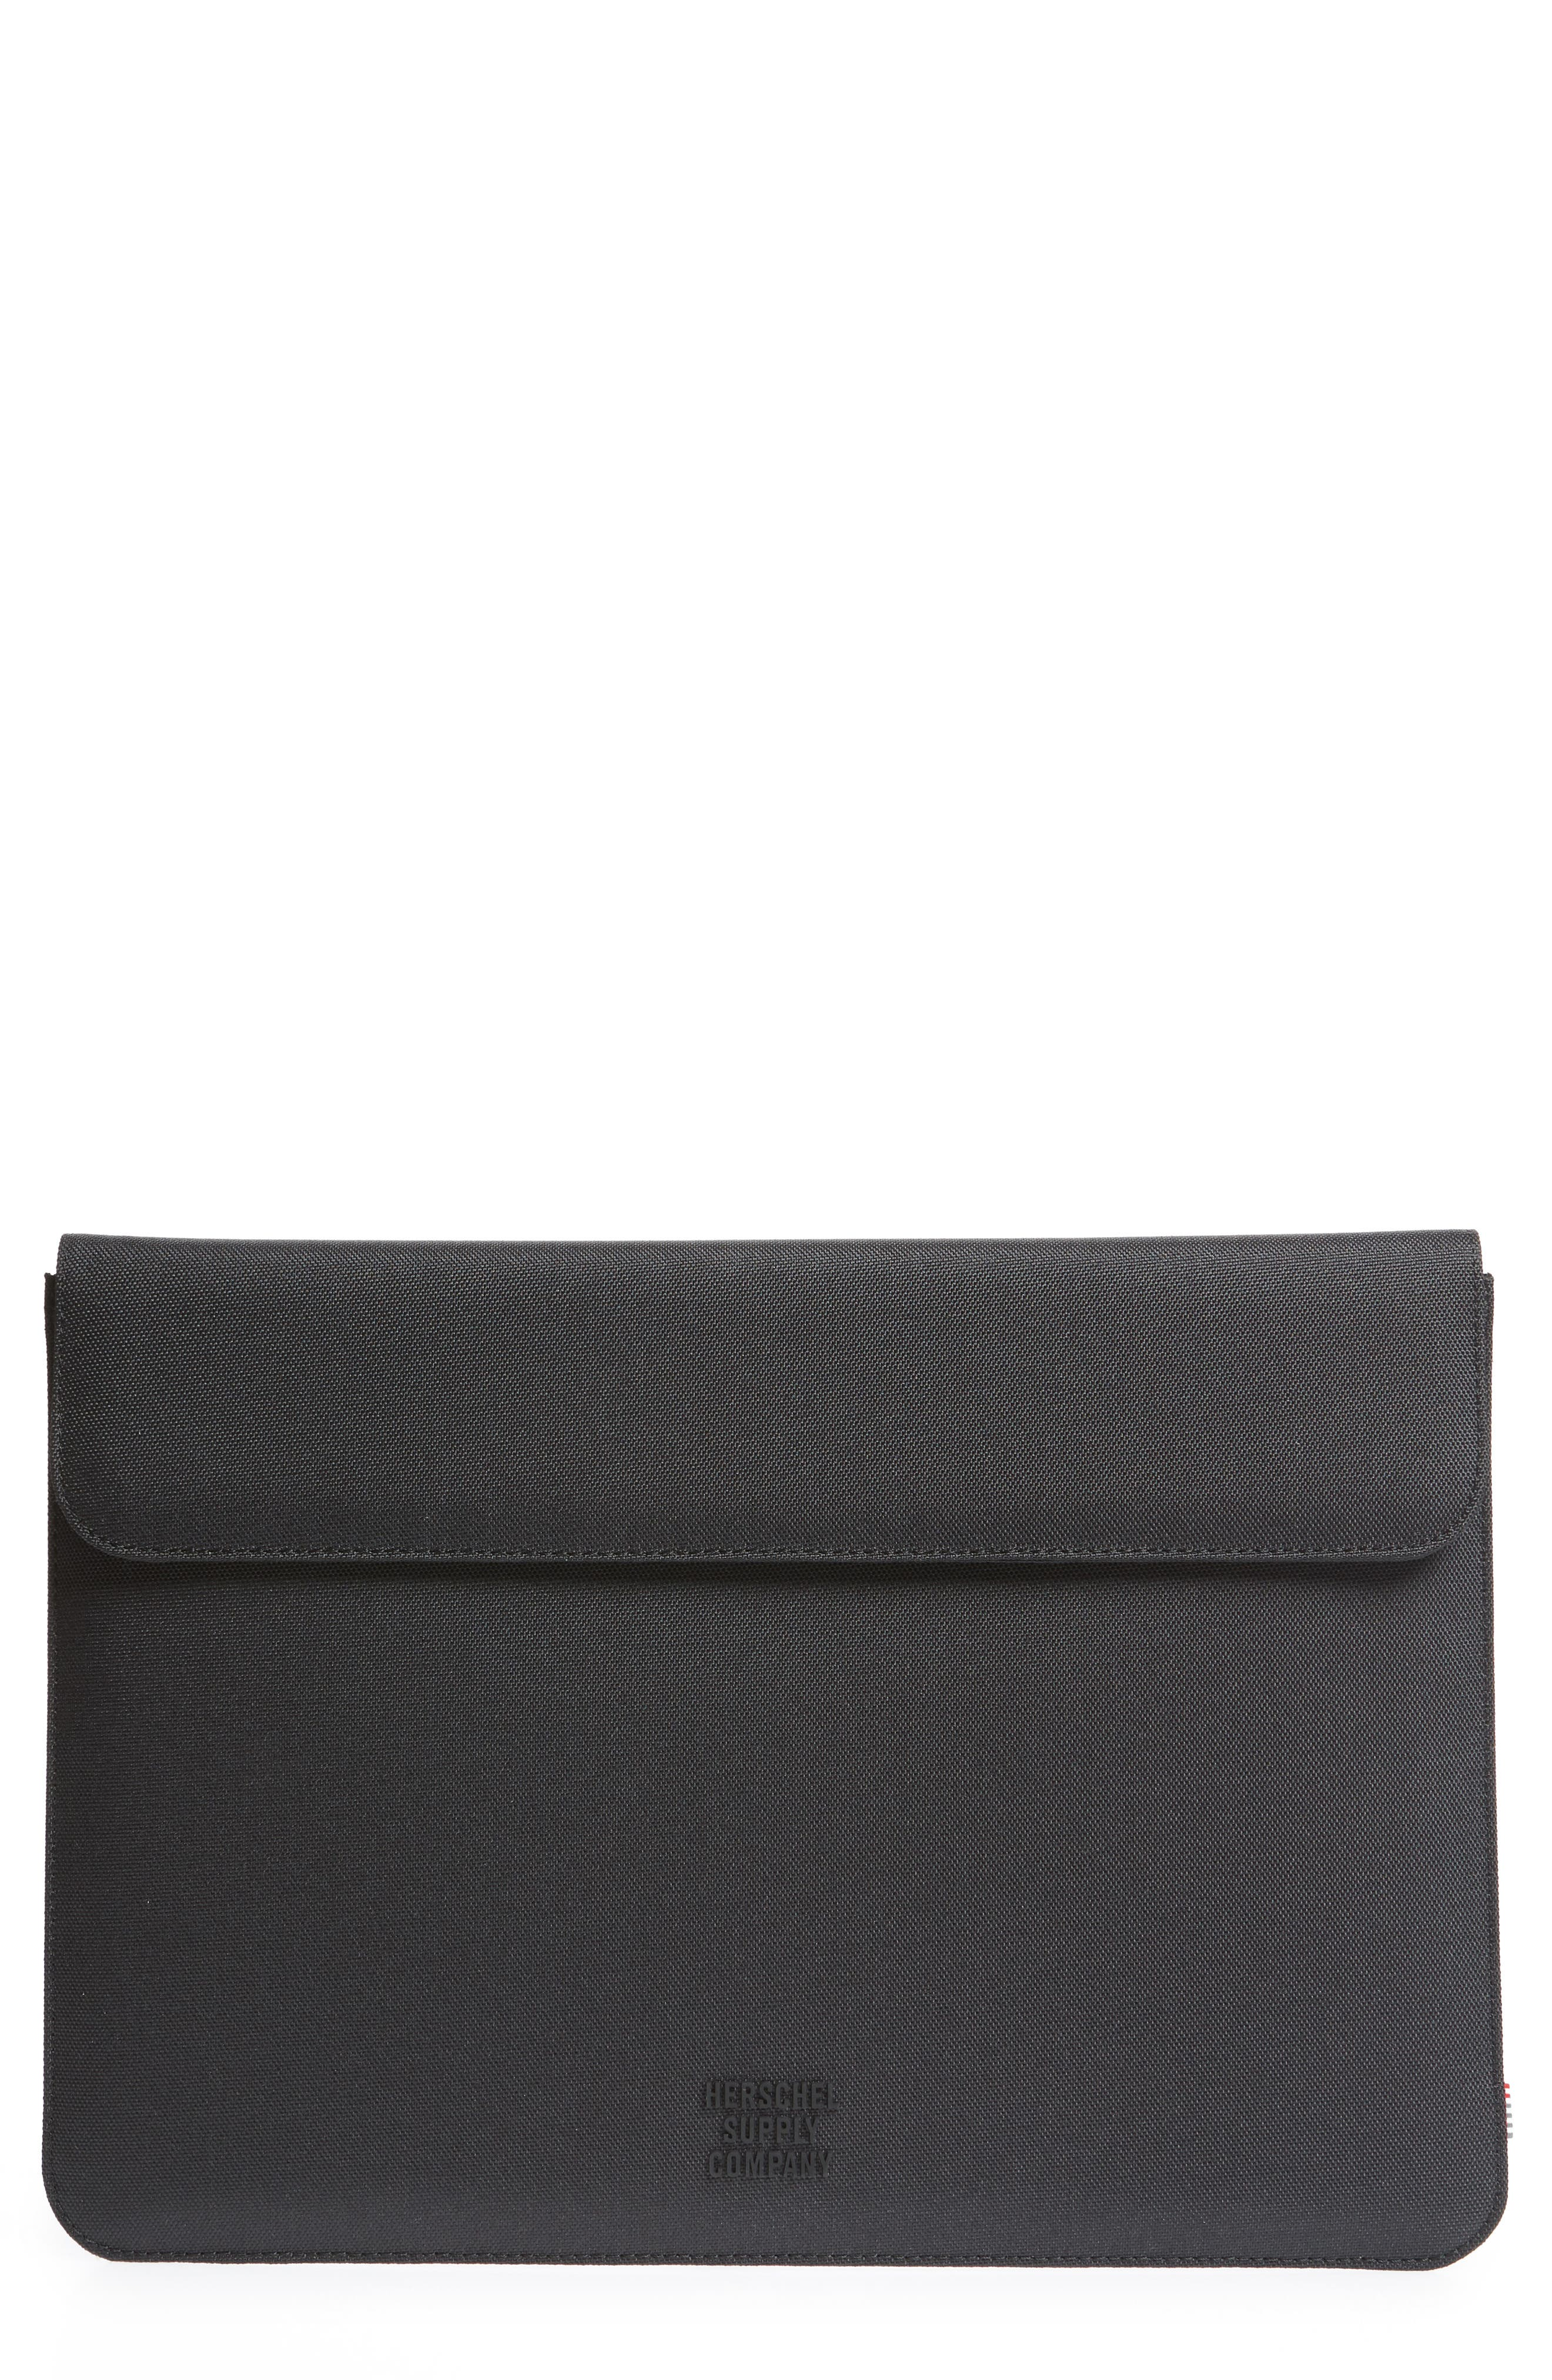 Spokane 13-Inch MacBook Canvas Sleeve,                             Main thumbnail 1, color,                             001